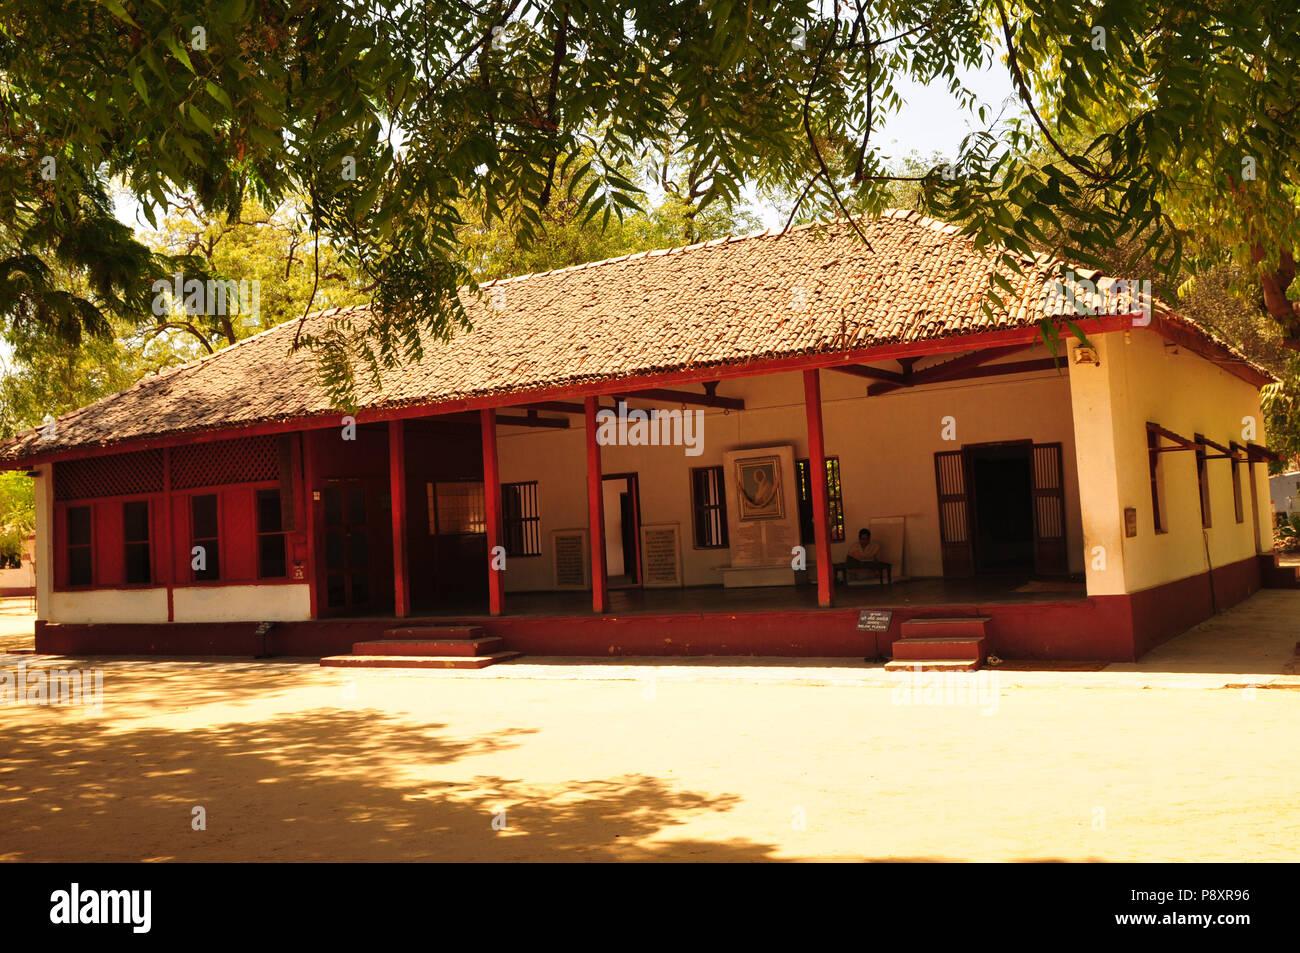 India: Ghandi's Ashram in Ahmedabad-City, Gujarat - Stock Image